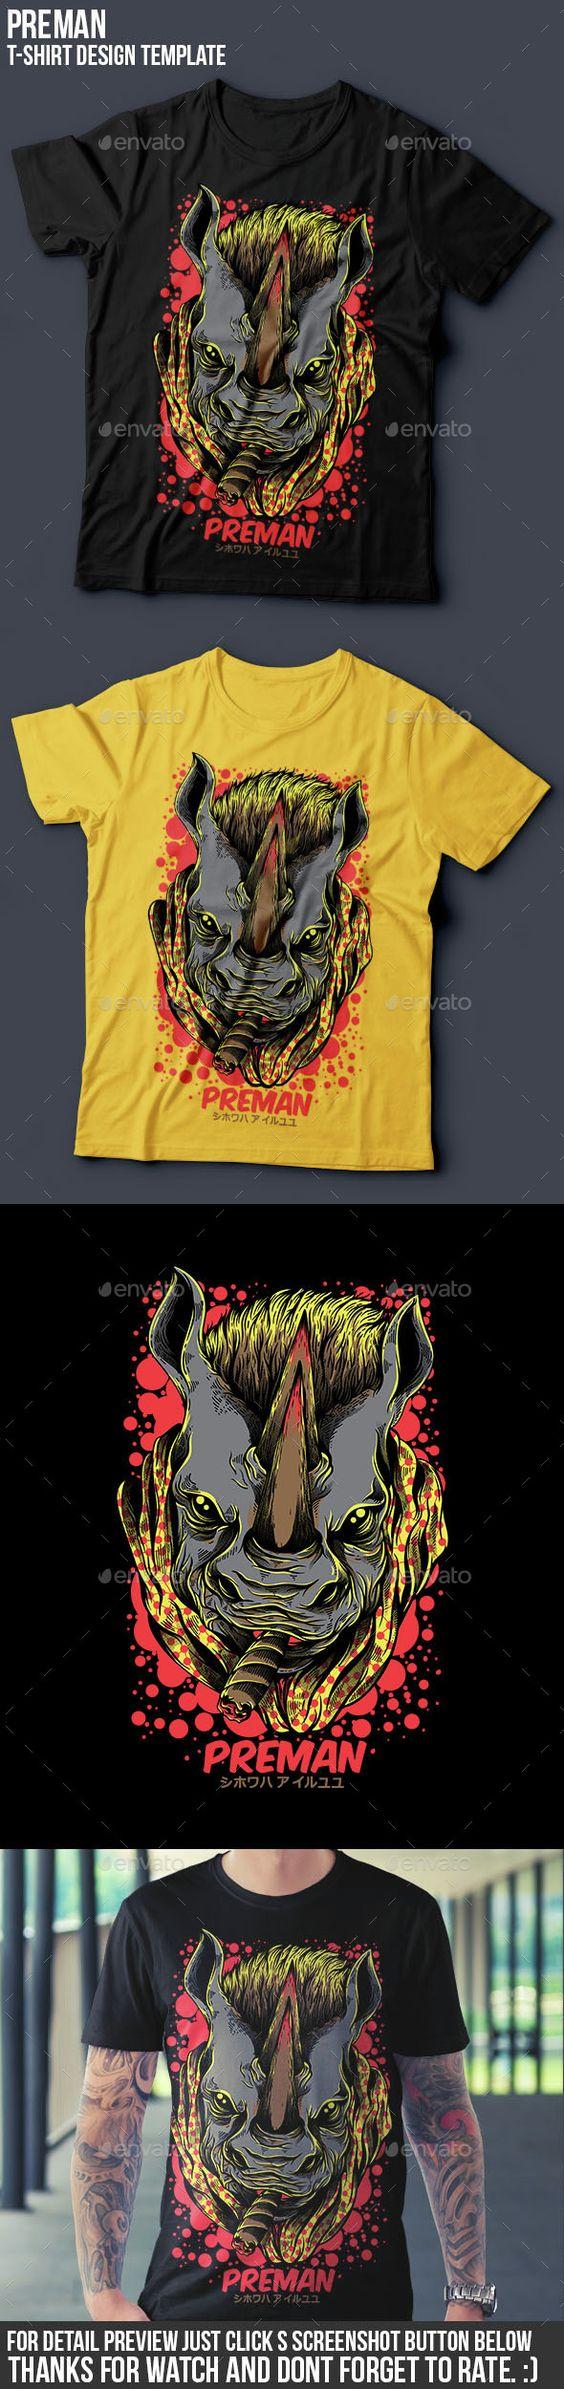 Shirt design resolution - Preman T Shirt Design Funny Designs